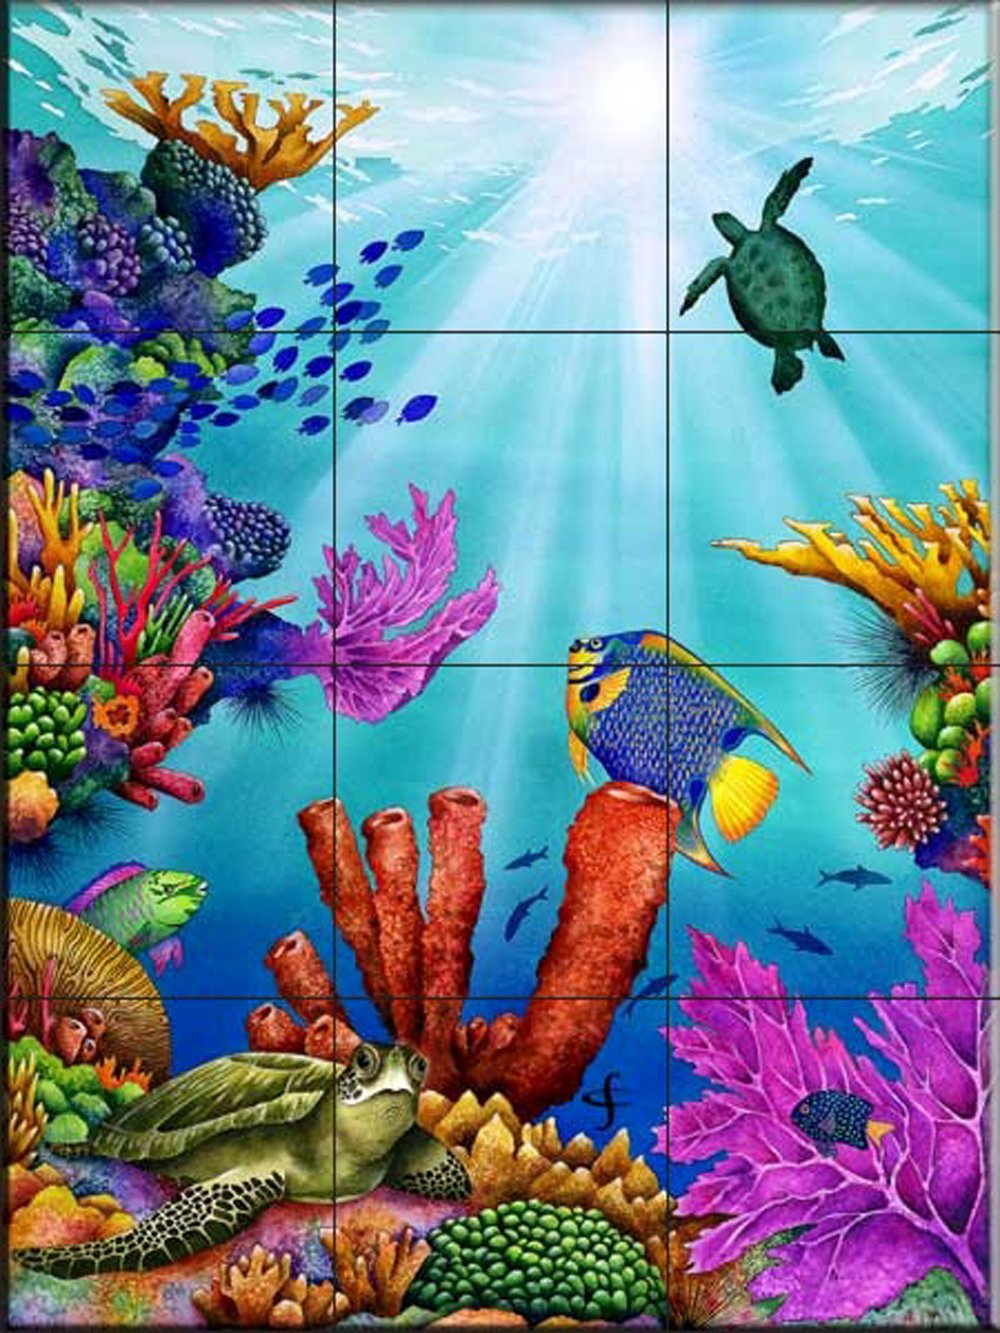 Ceramic Tile Mural - High Noon - by Carolyn Steele - Kitchen backsplash/Bathroom Shower